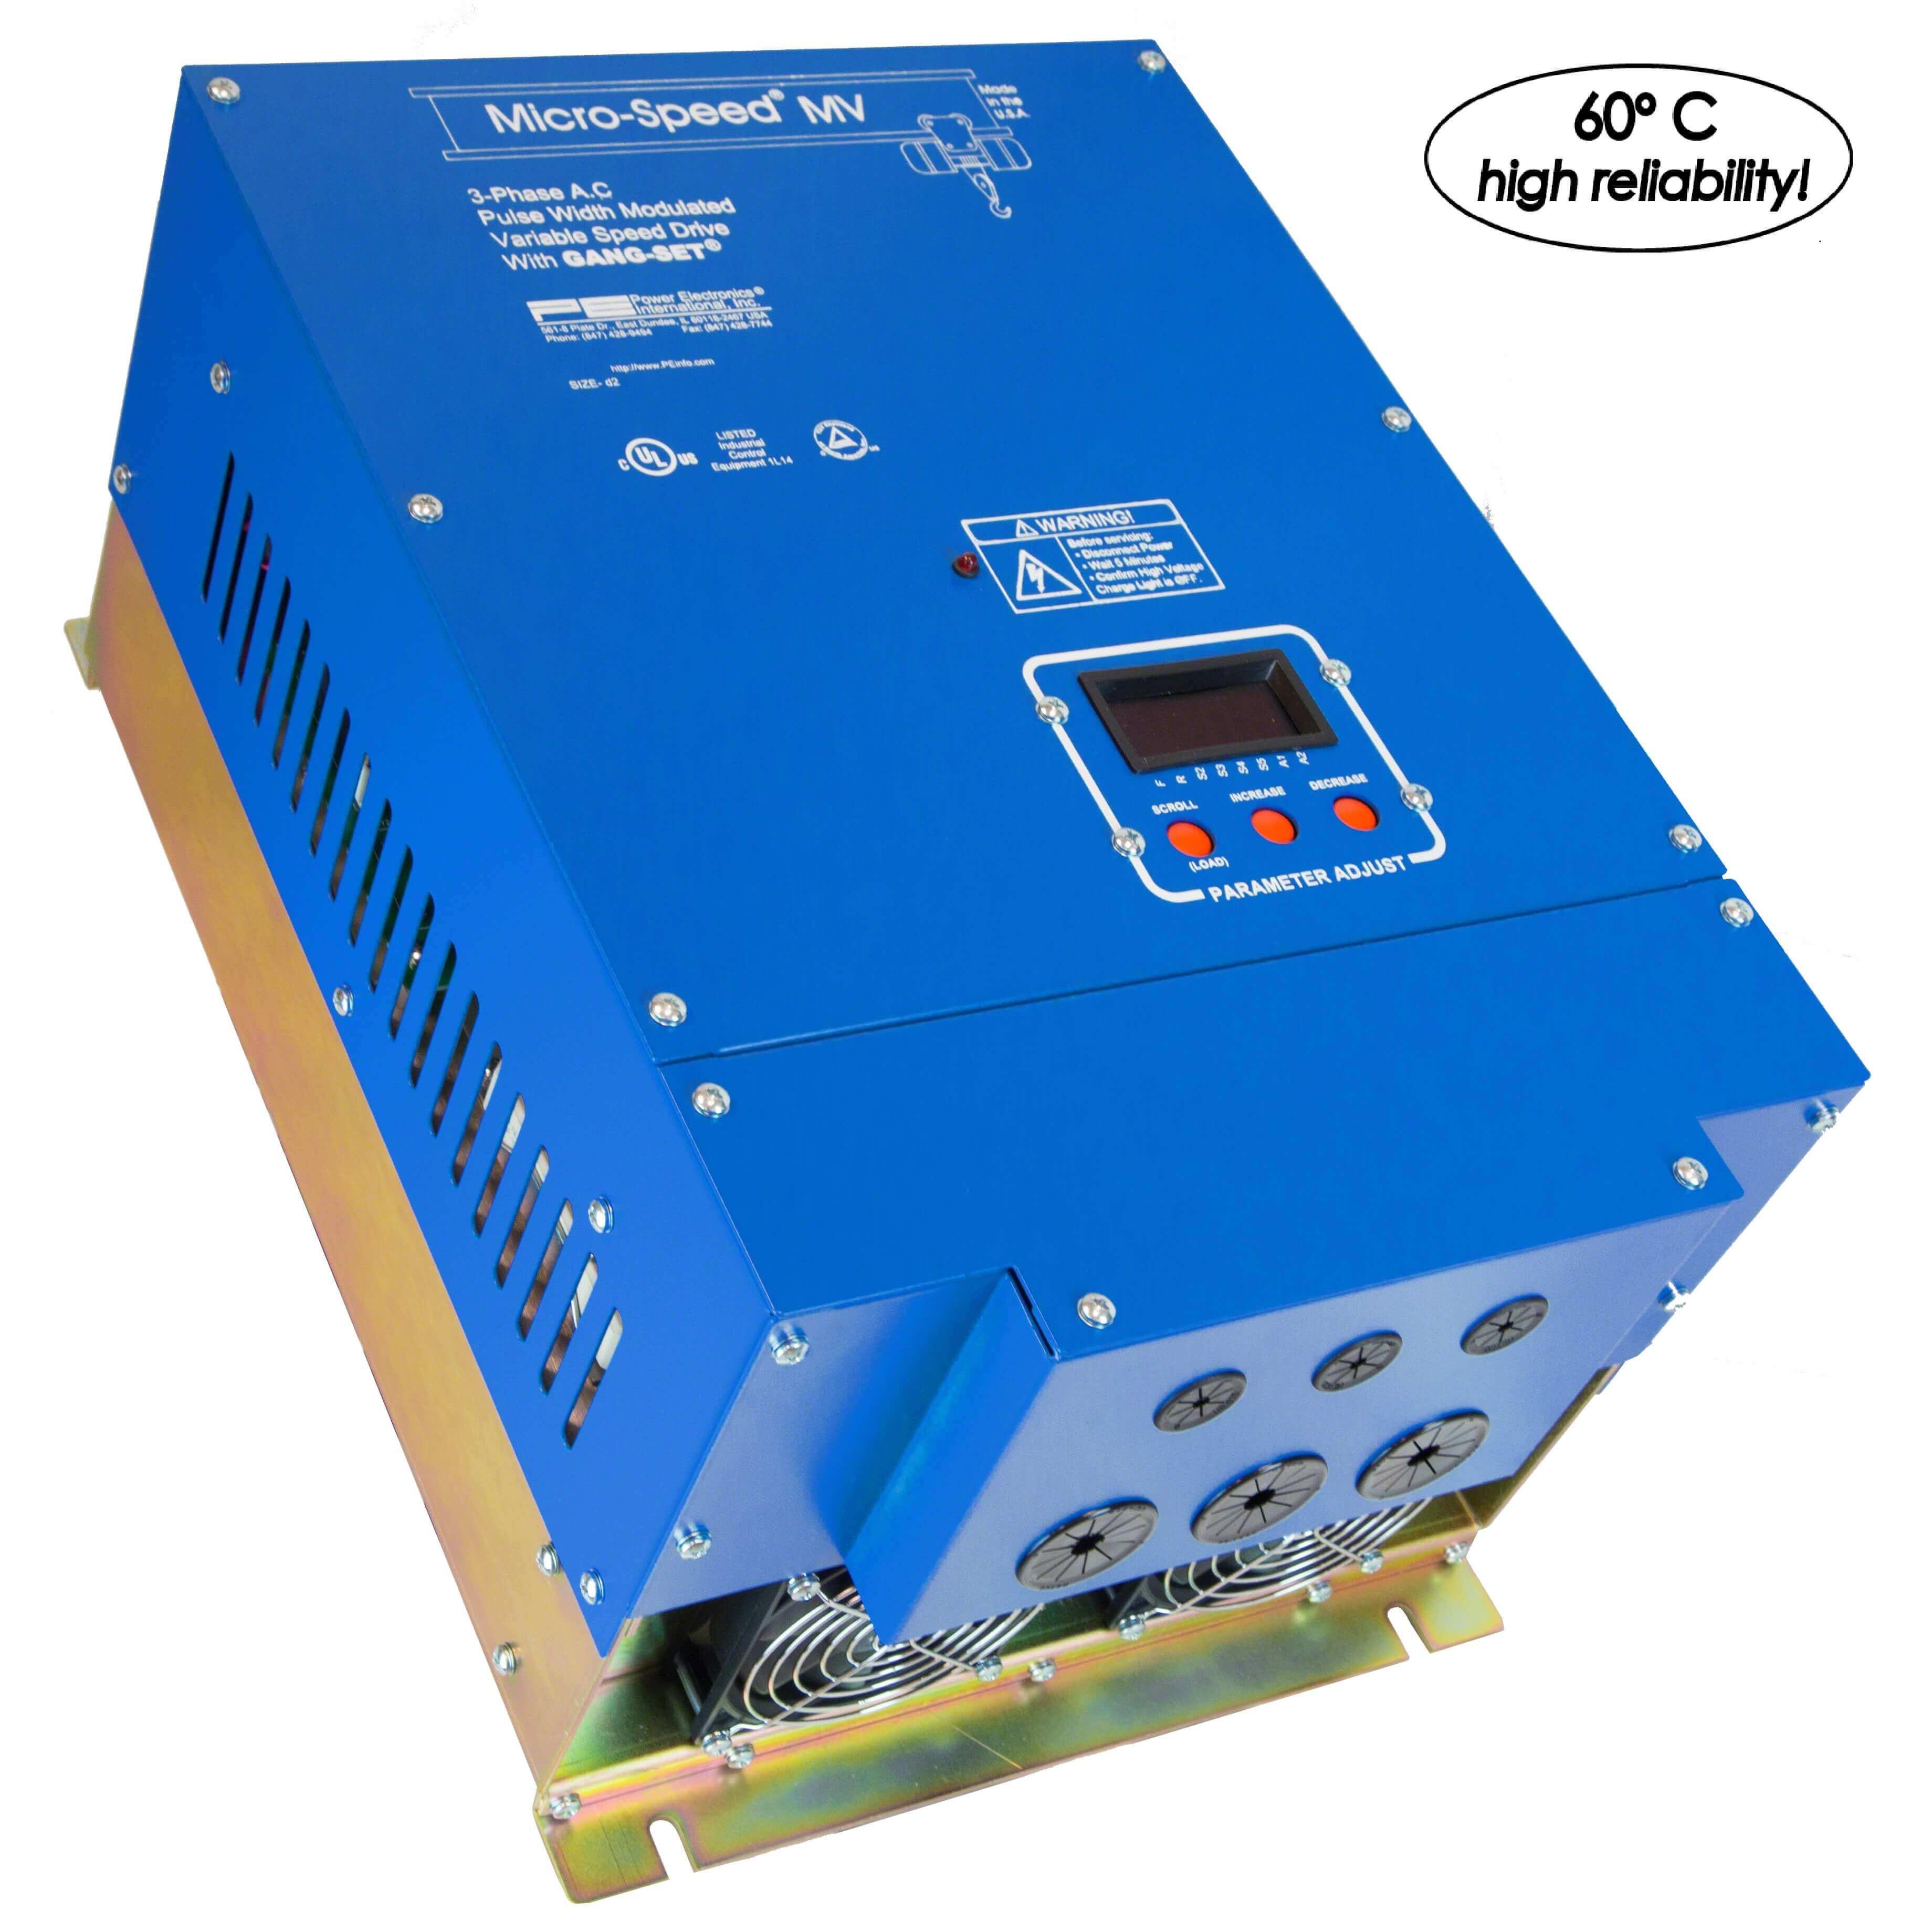 Micro Speed Multi Vector (1-600+HP) (Power Elec.)